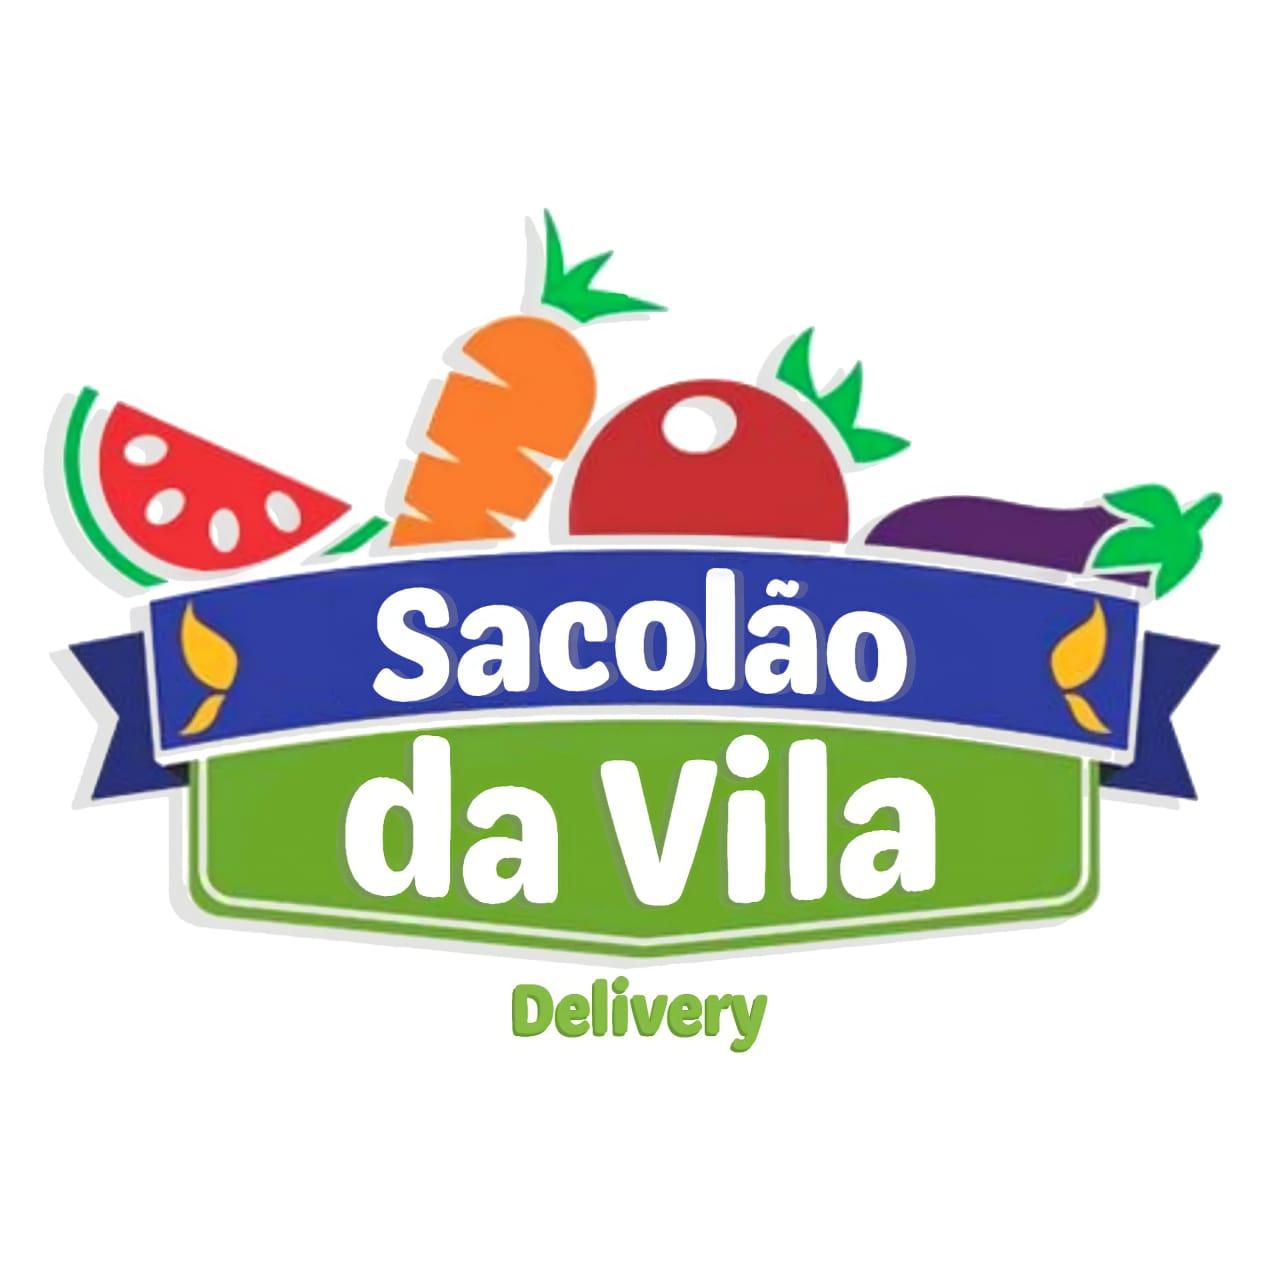 Sacol_o_da_vila_